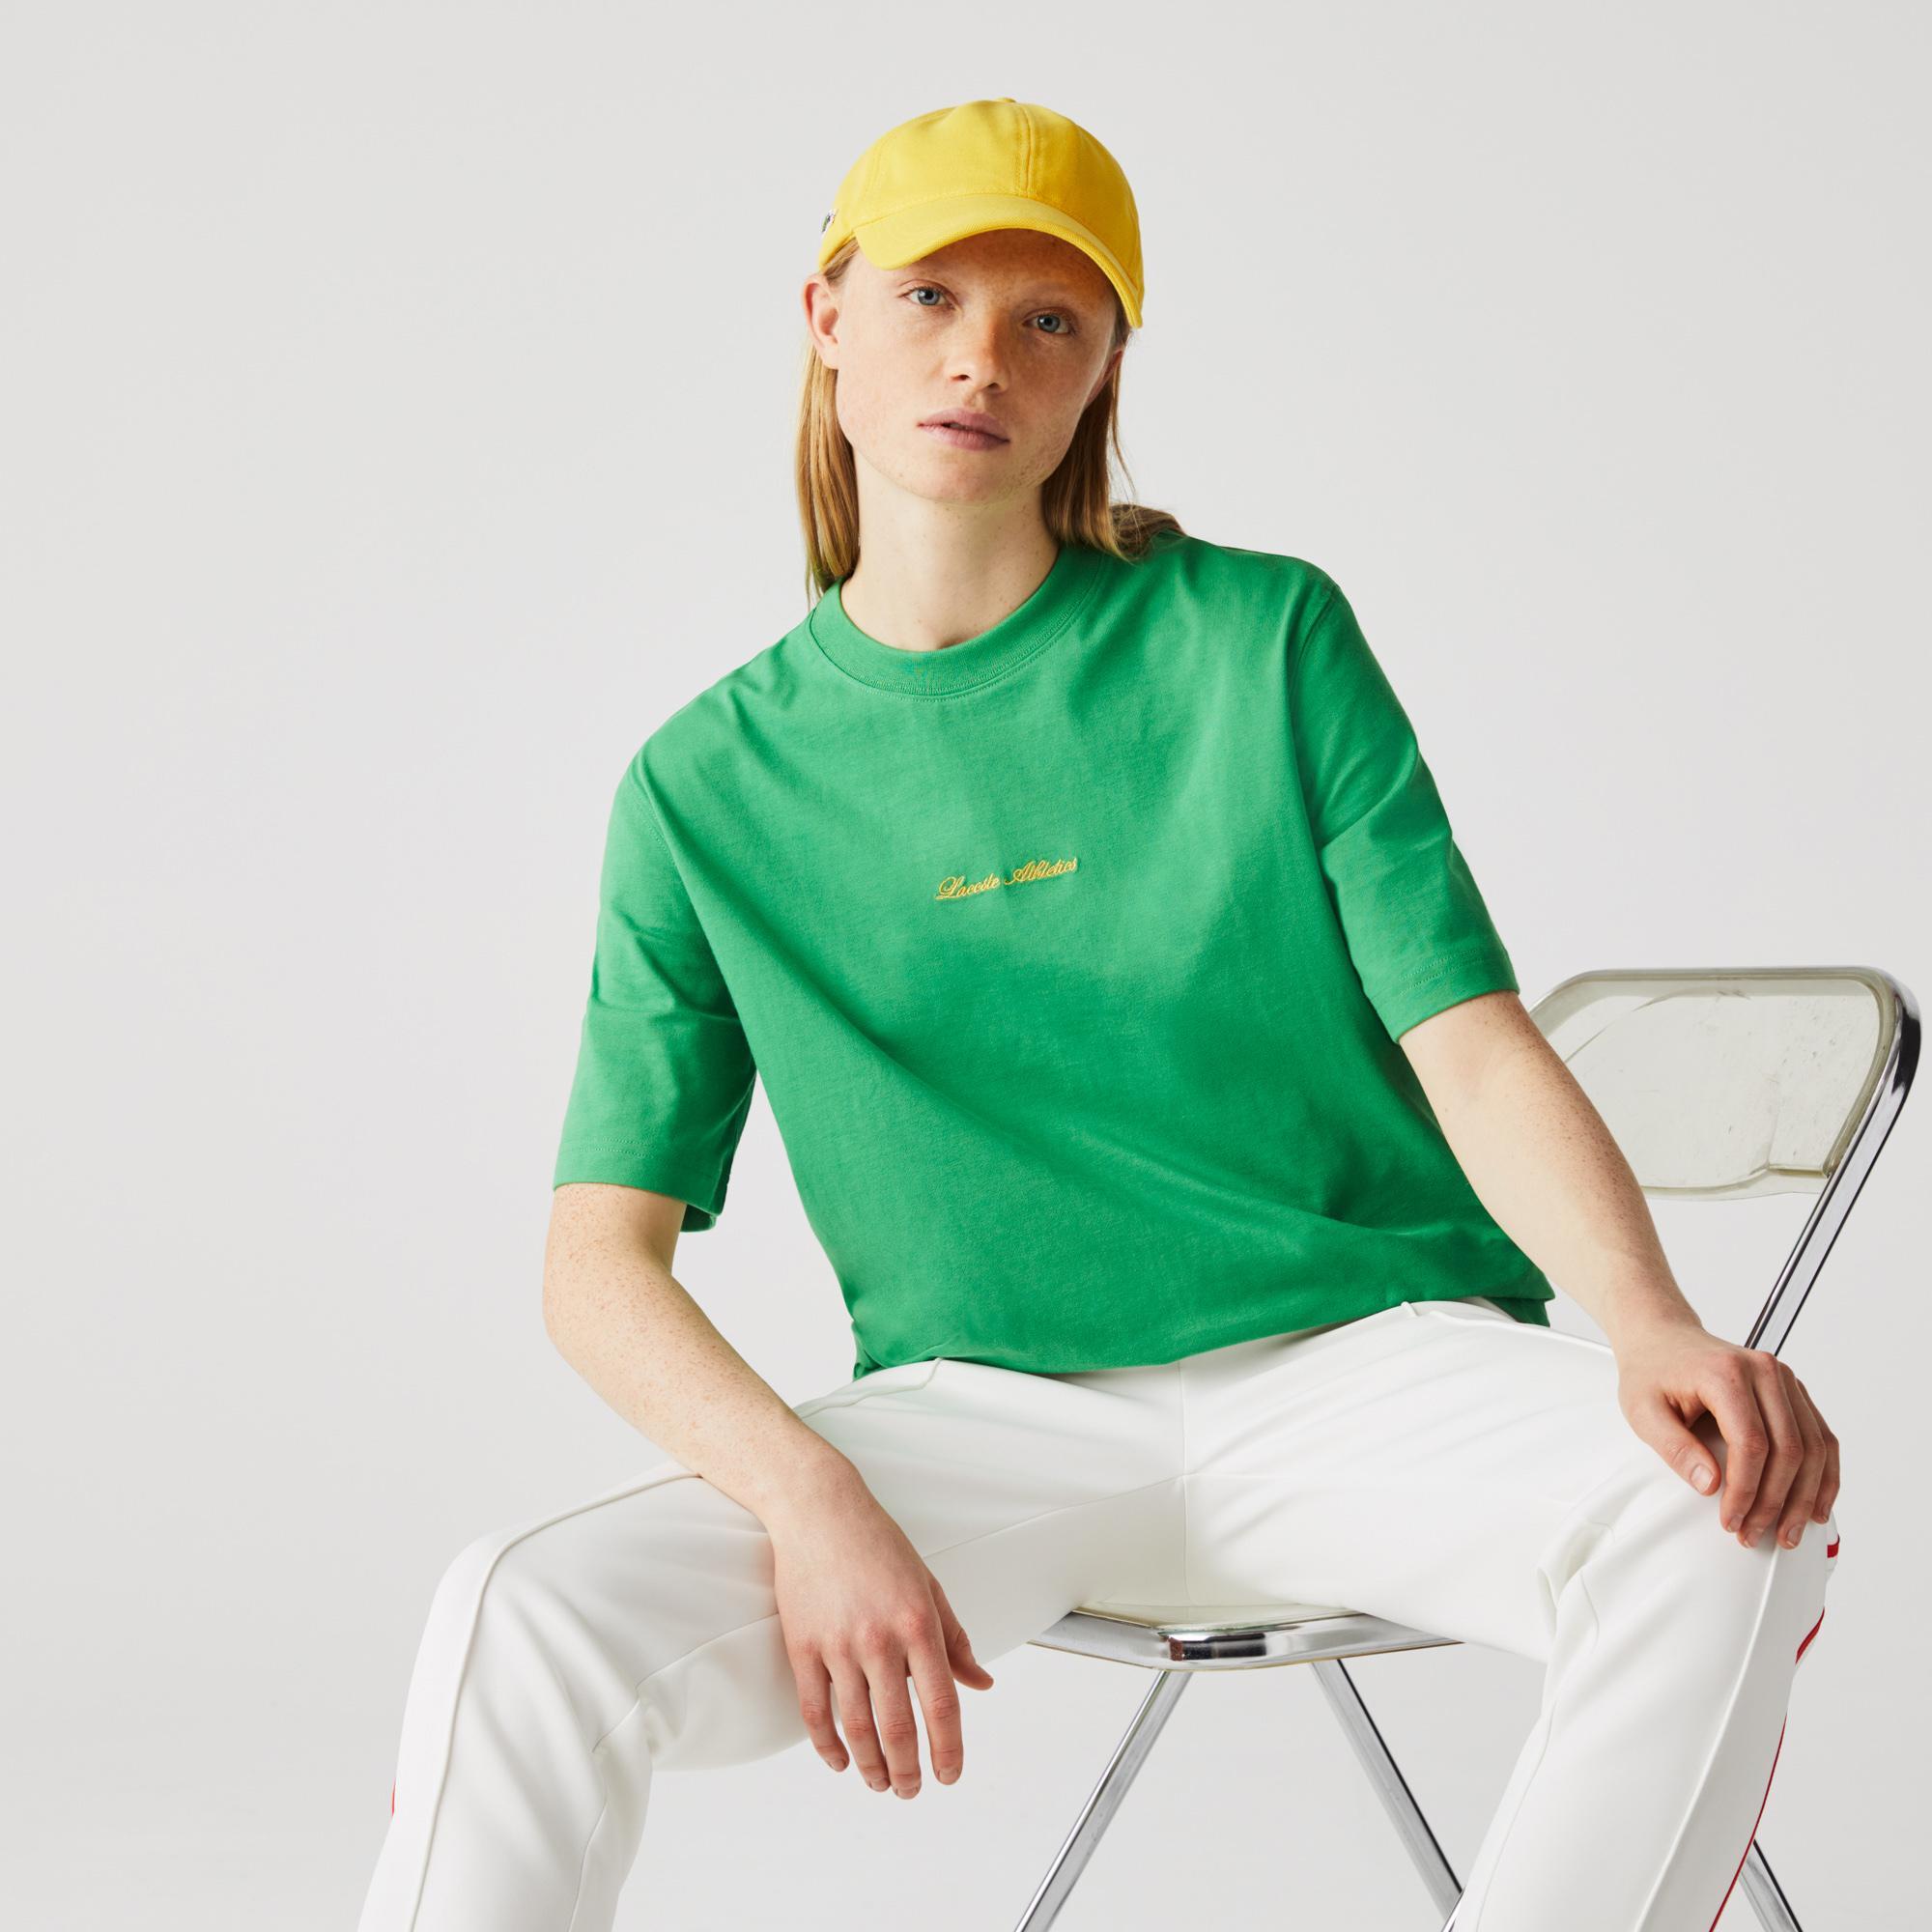 Lacoste Unisex LIVE Loose Fit Golden Embroidery Cotton T-shirt